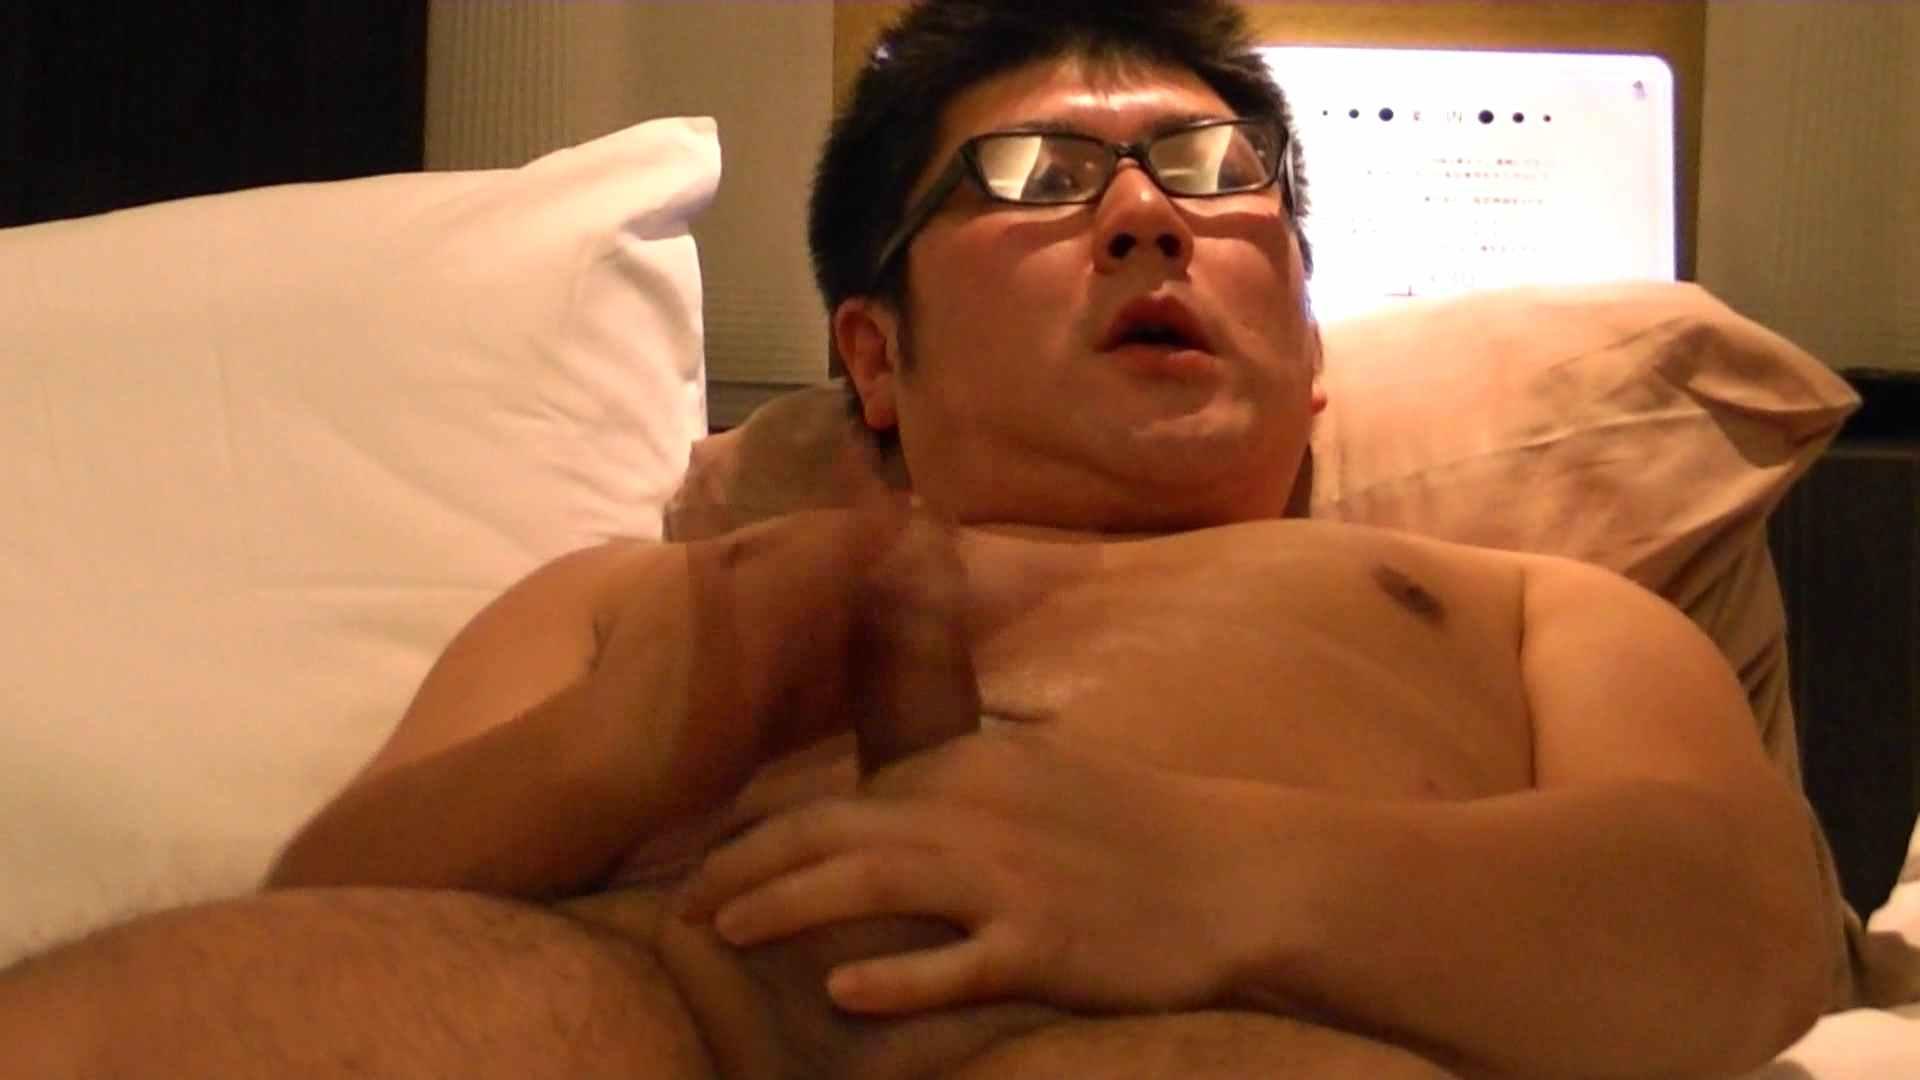 Mr.オナックスさん投稿!HD 貴方のオナニー三万円で撮影させてください。VOL.03 後編 完全無修正でお届け | オナニー特集  83pic 75